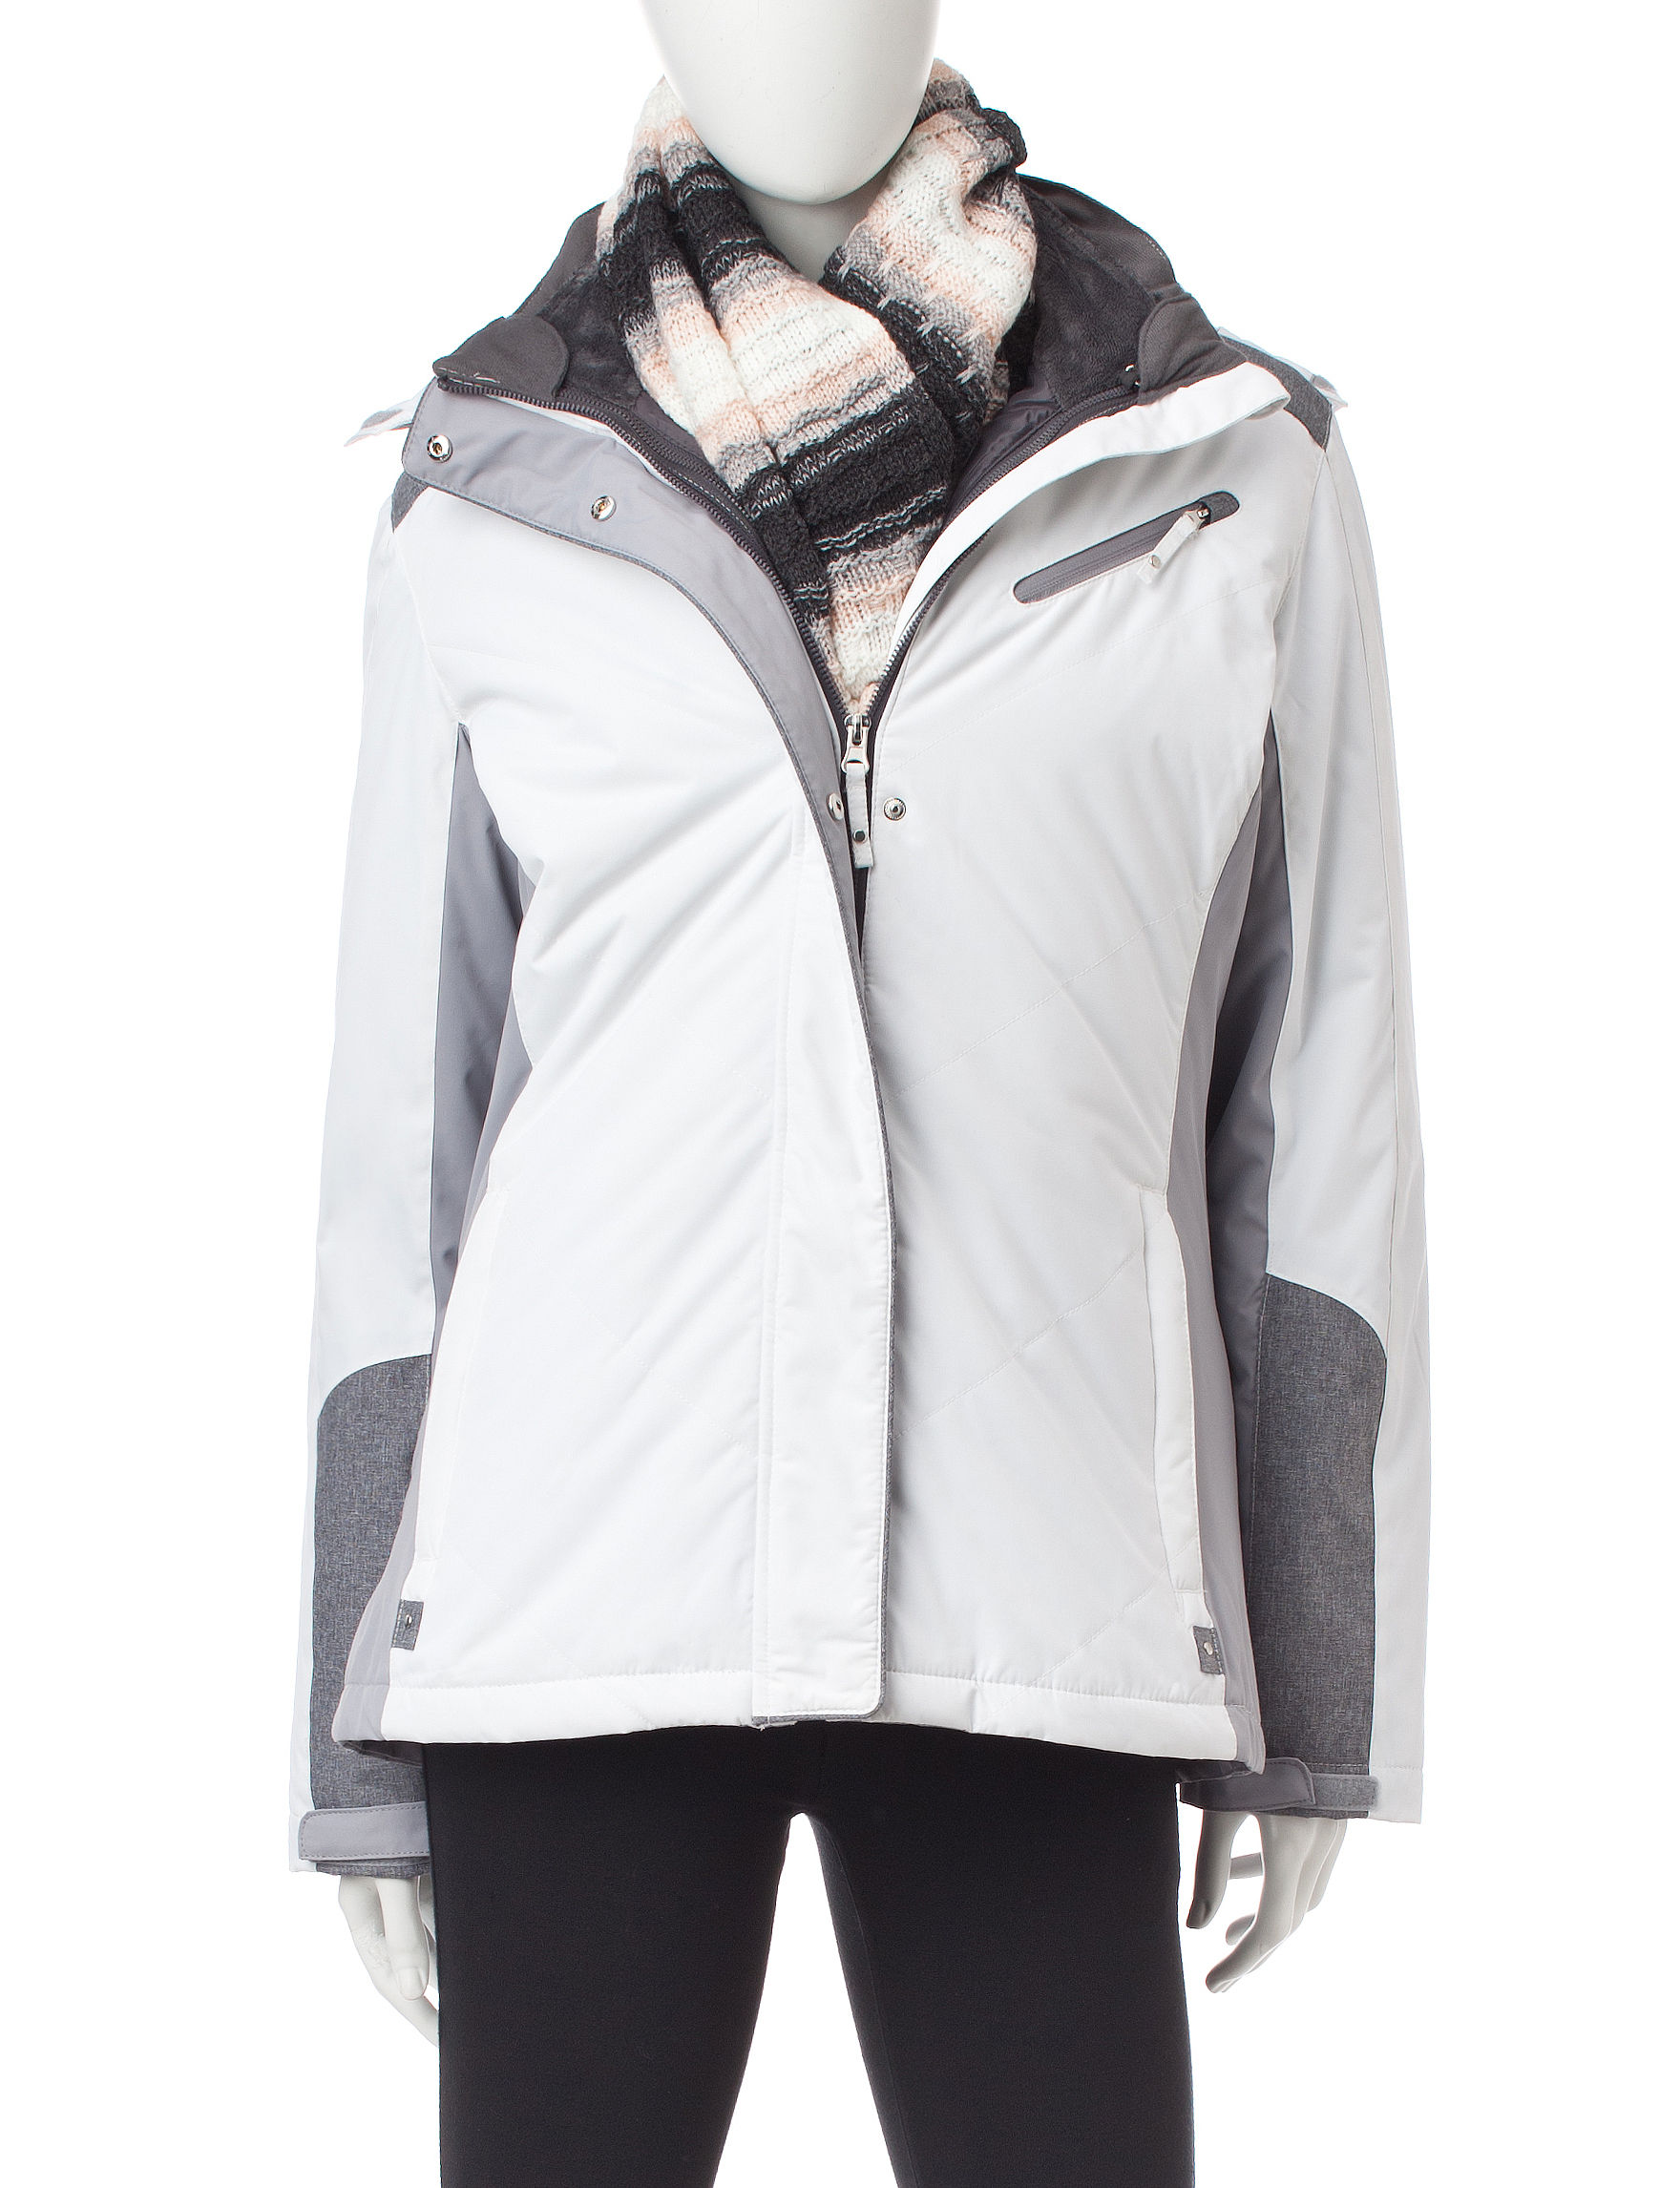 Mackintosh White Lightweight Jackets & Blazers